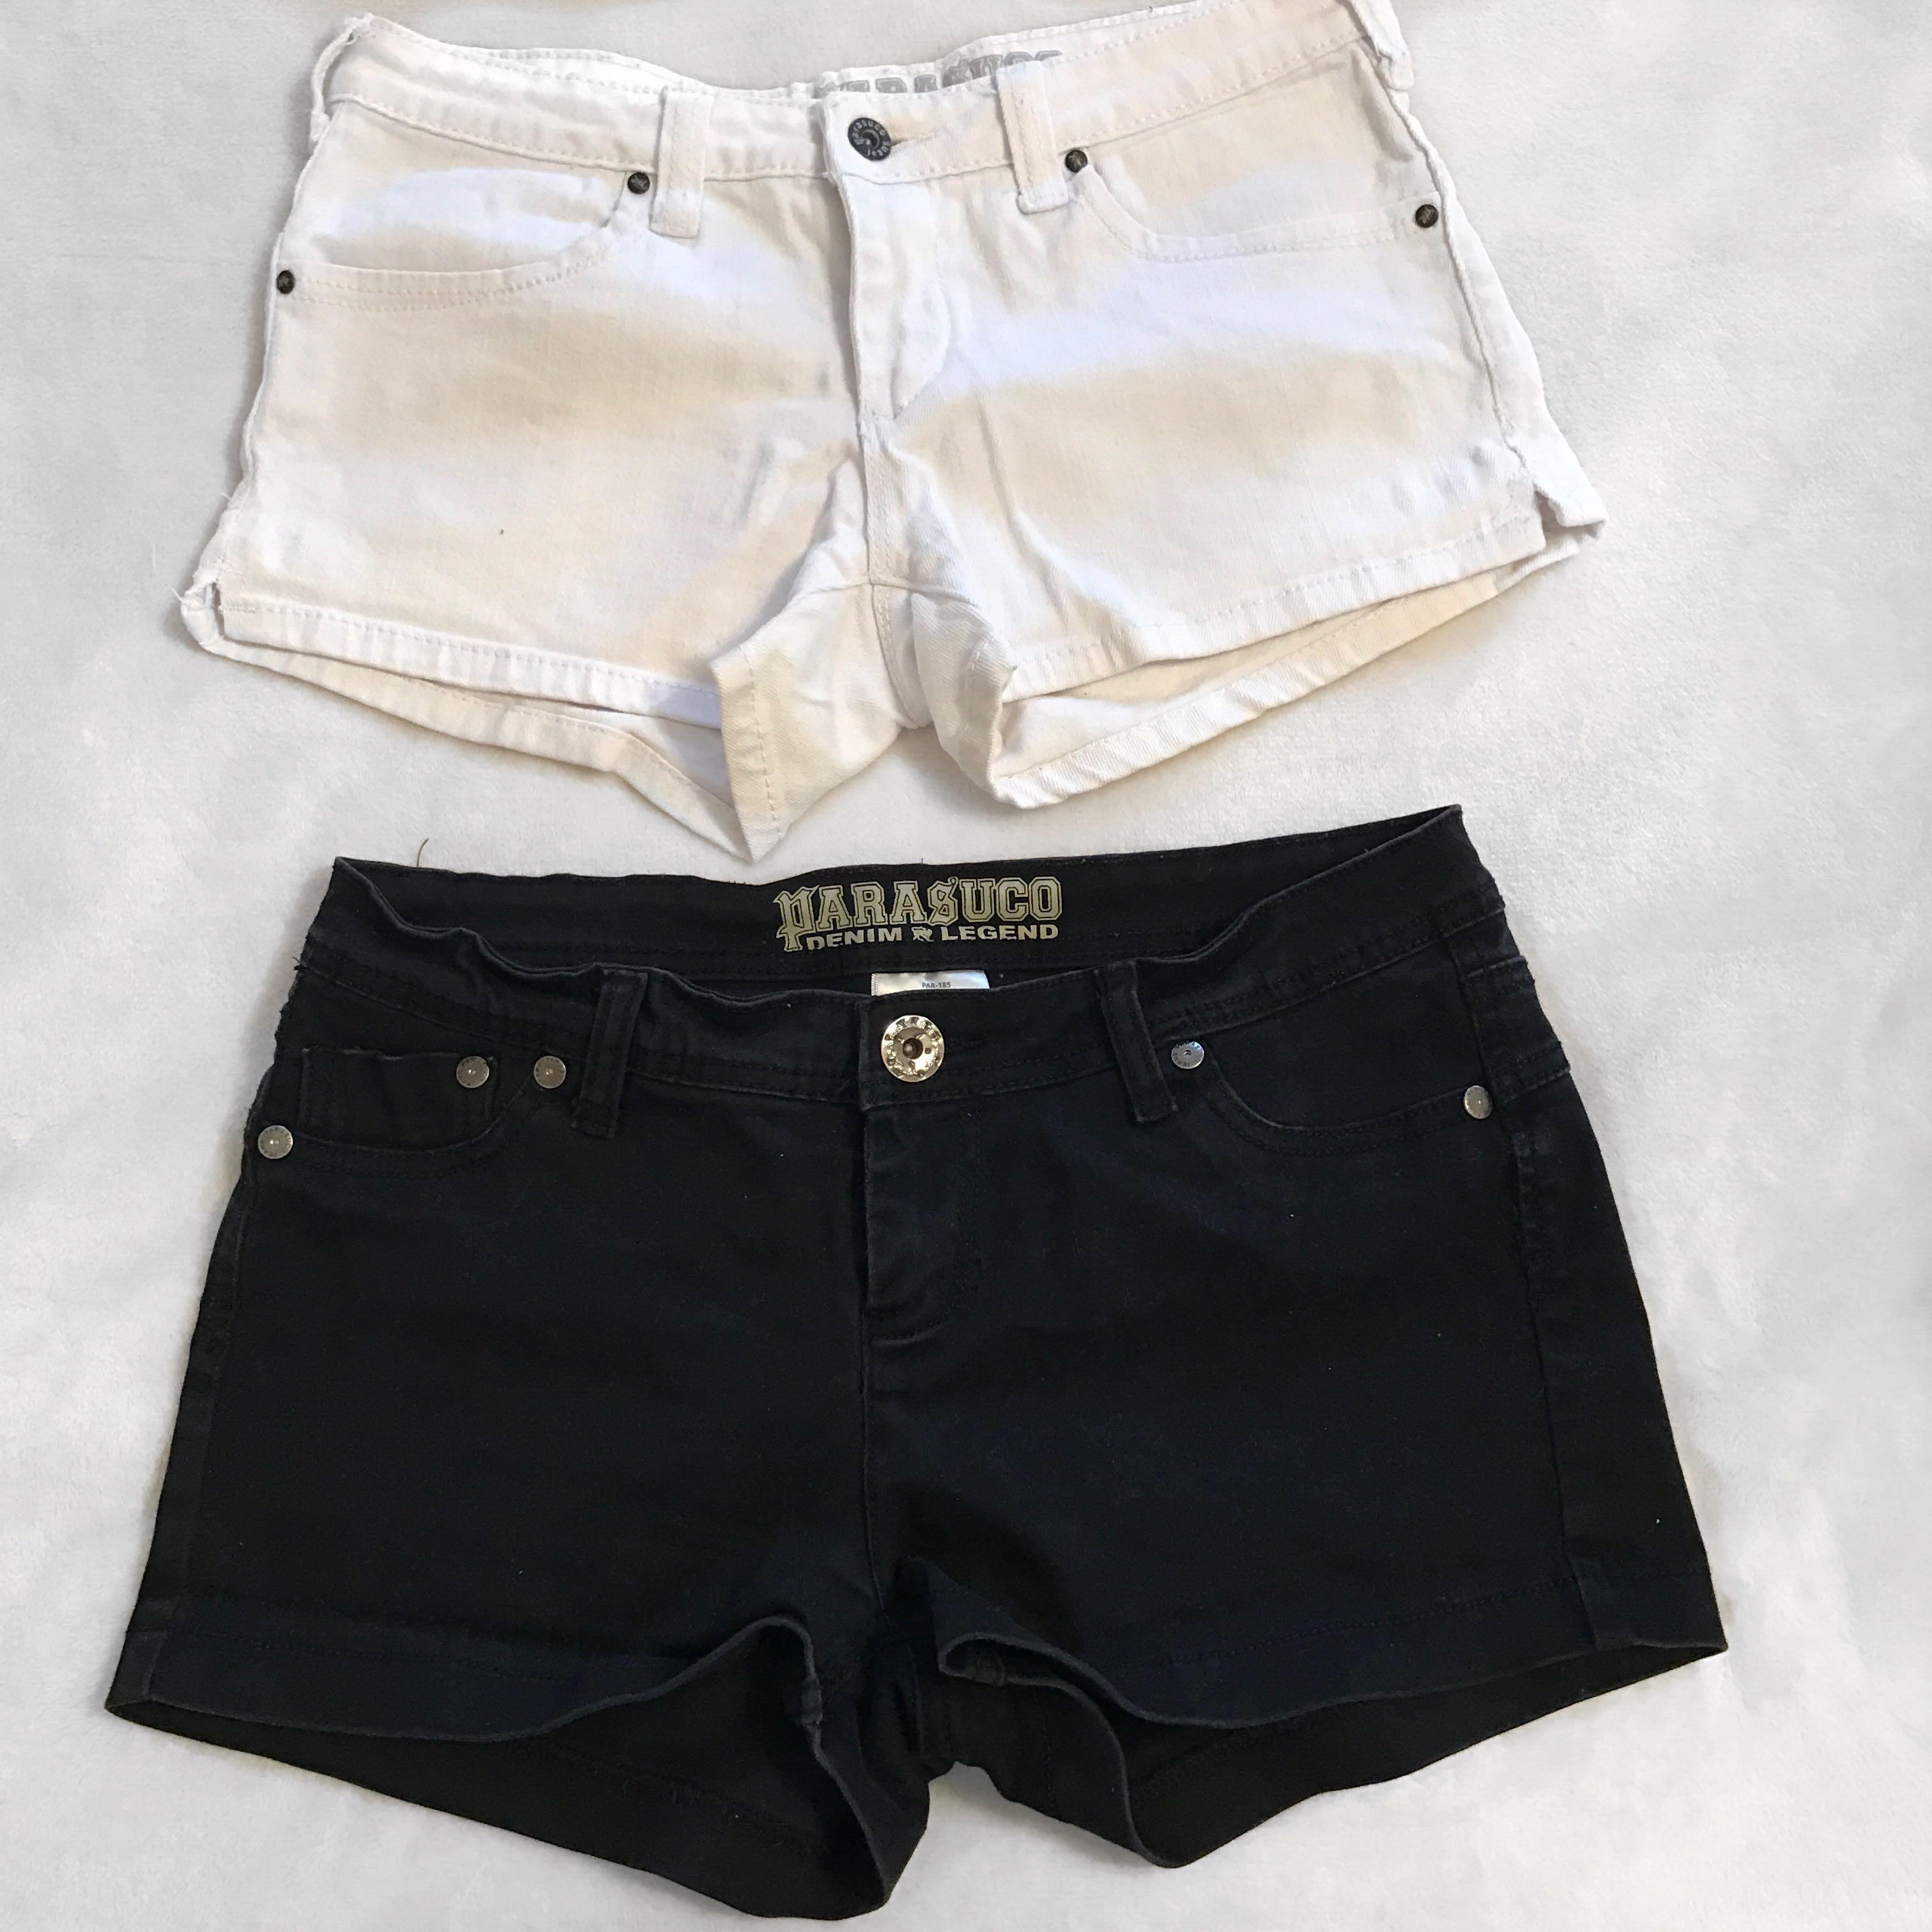 PARASUCO jean shorts